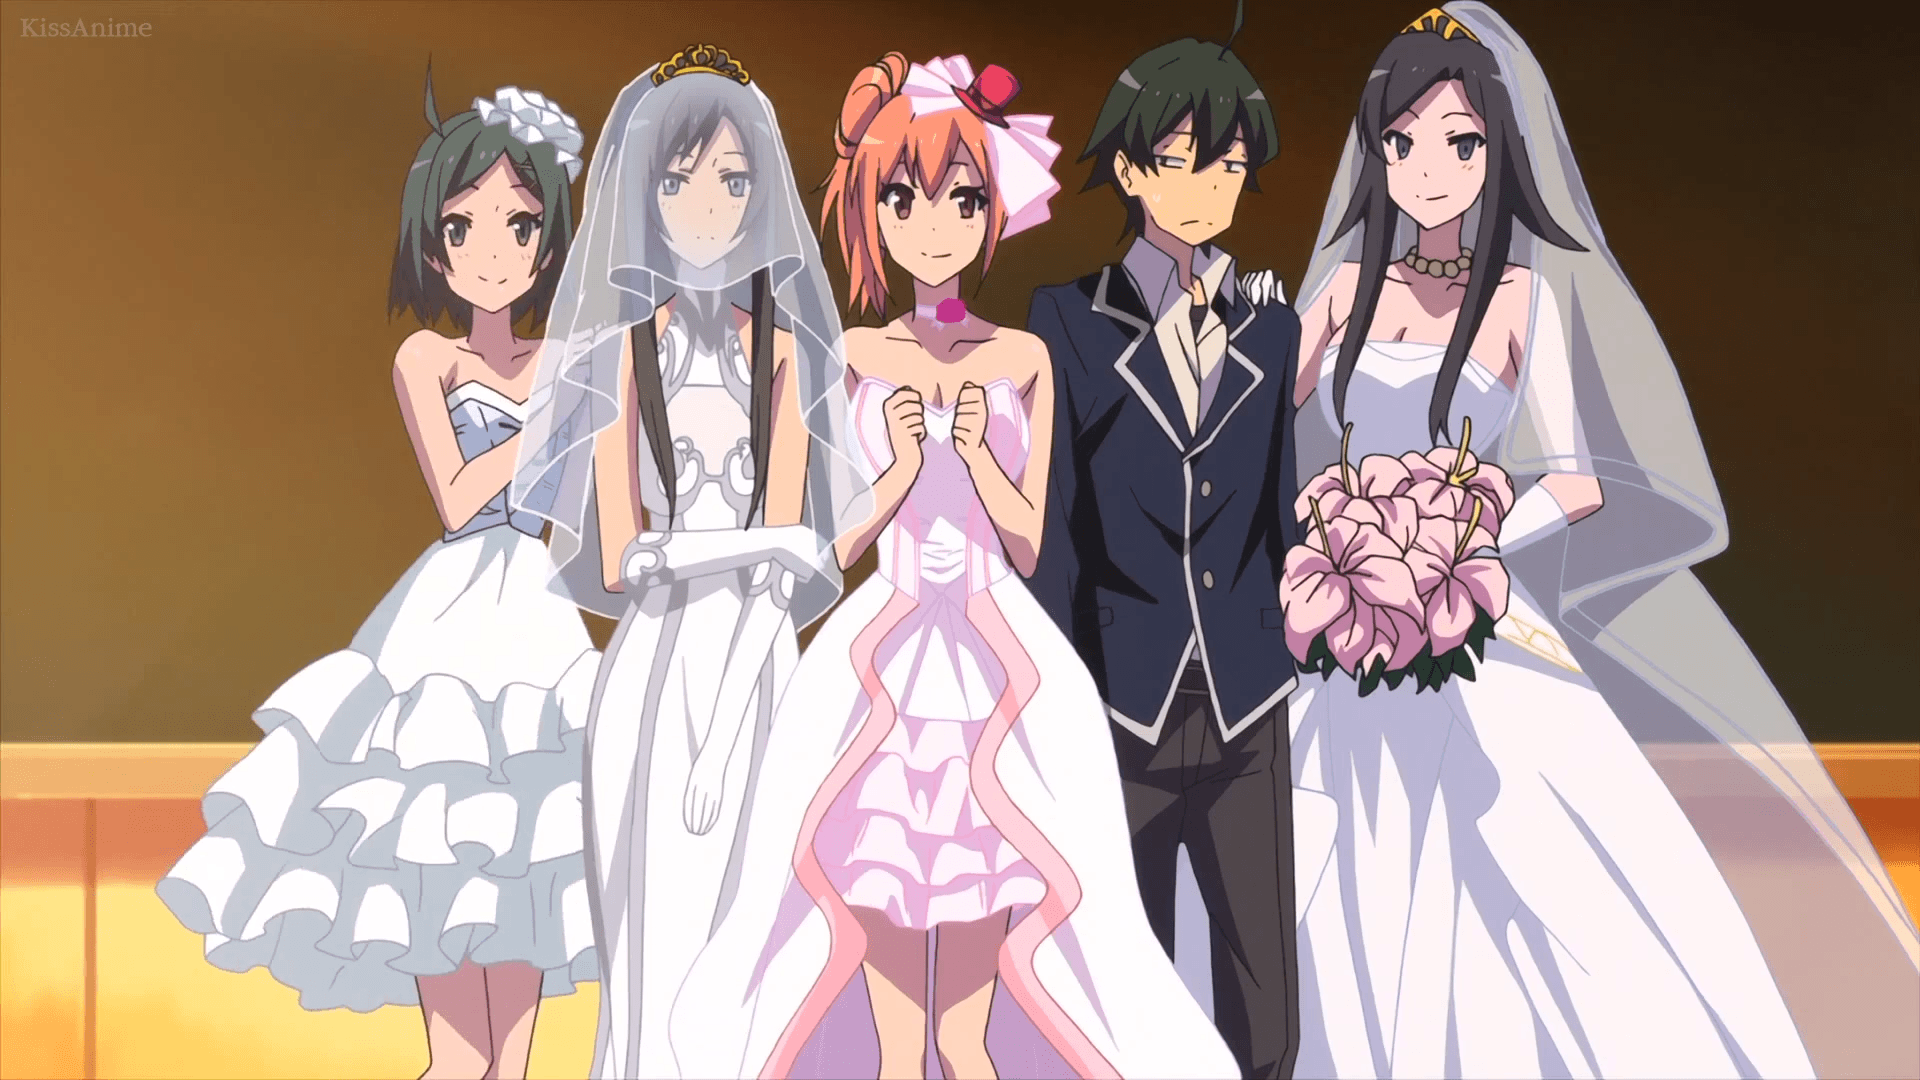 Anime Oregairu Wallpapers Top Free Anime Oregairu Backgrounds Wallpaperaccess